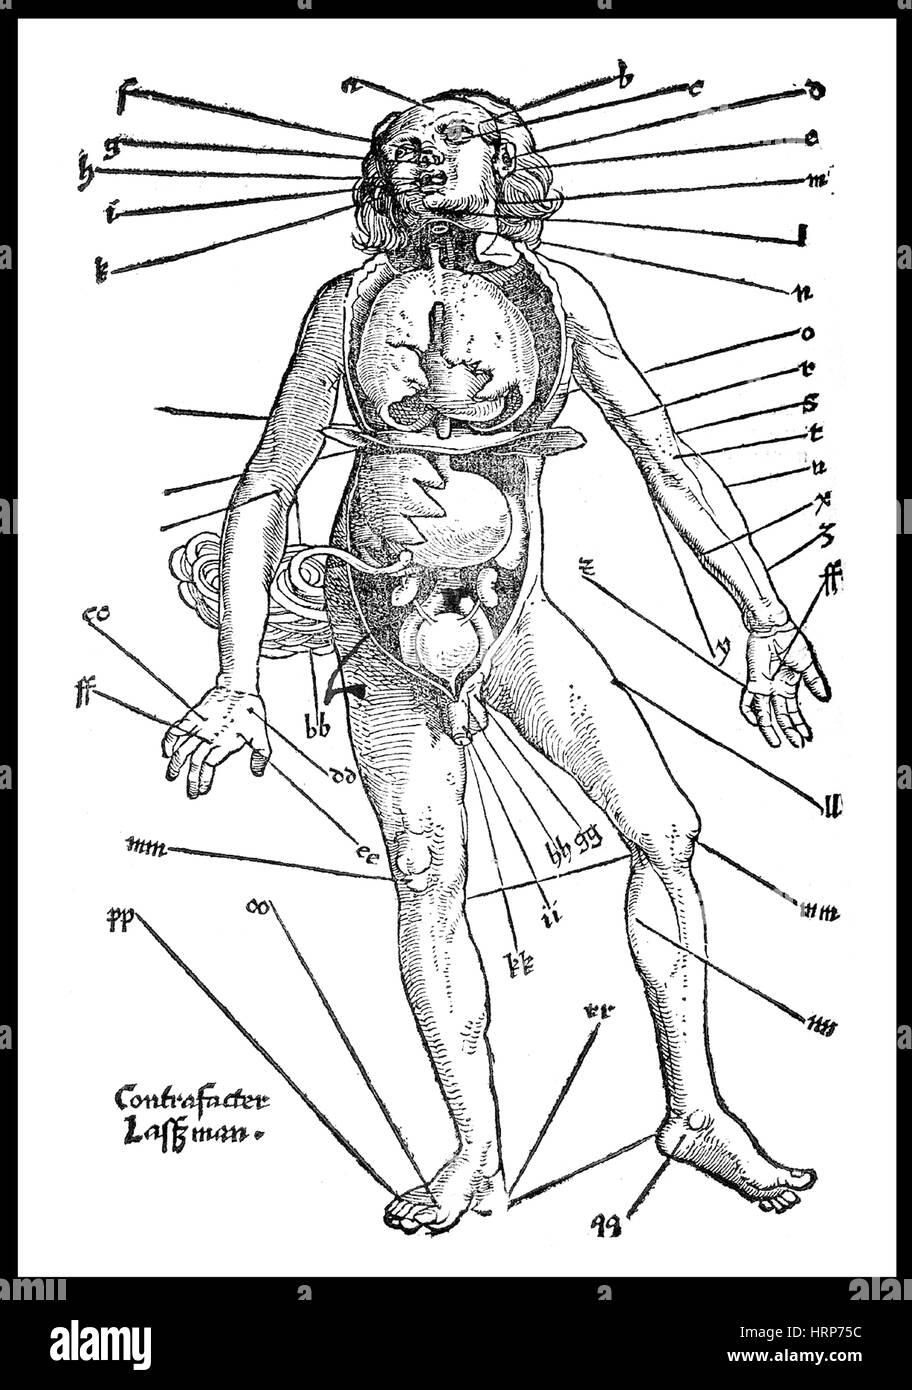 Aderlass, 'Feldbuch der Wundartzney', 1528 Stockbild